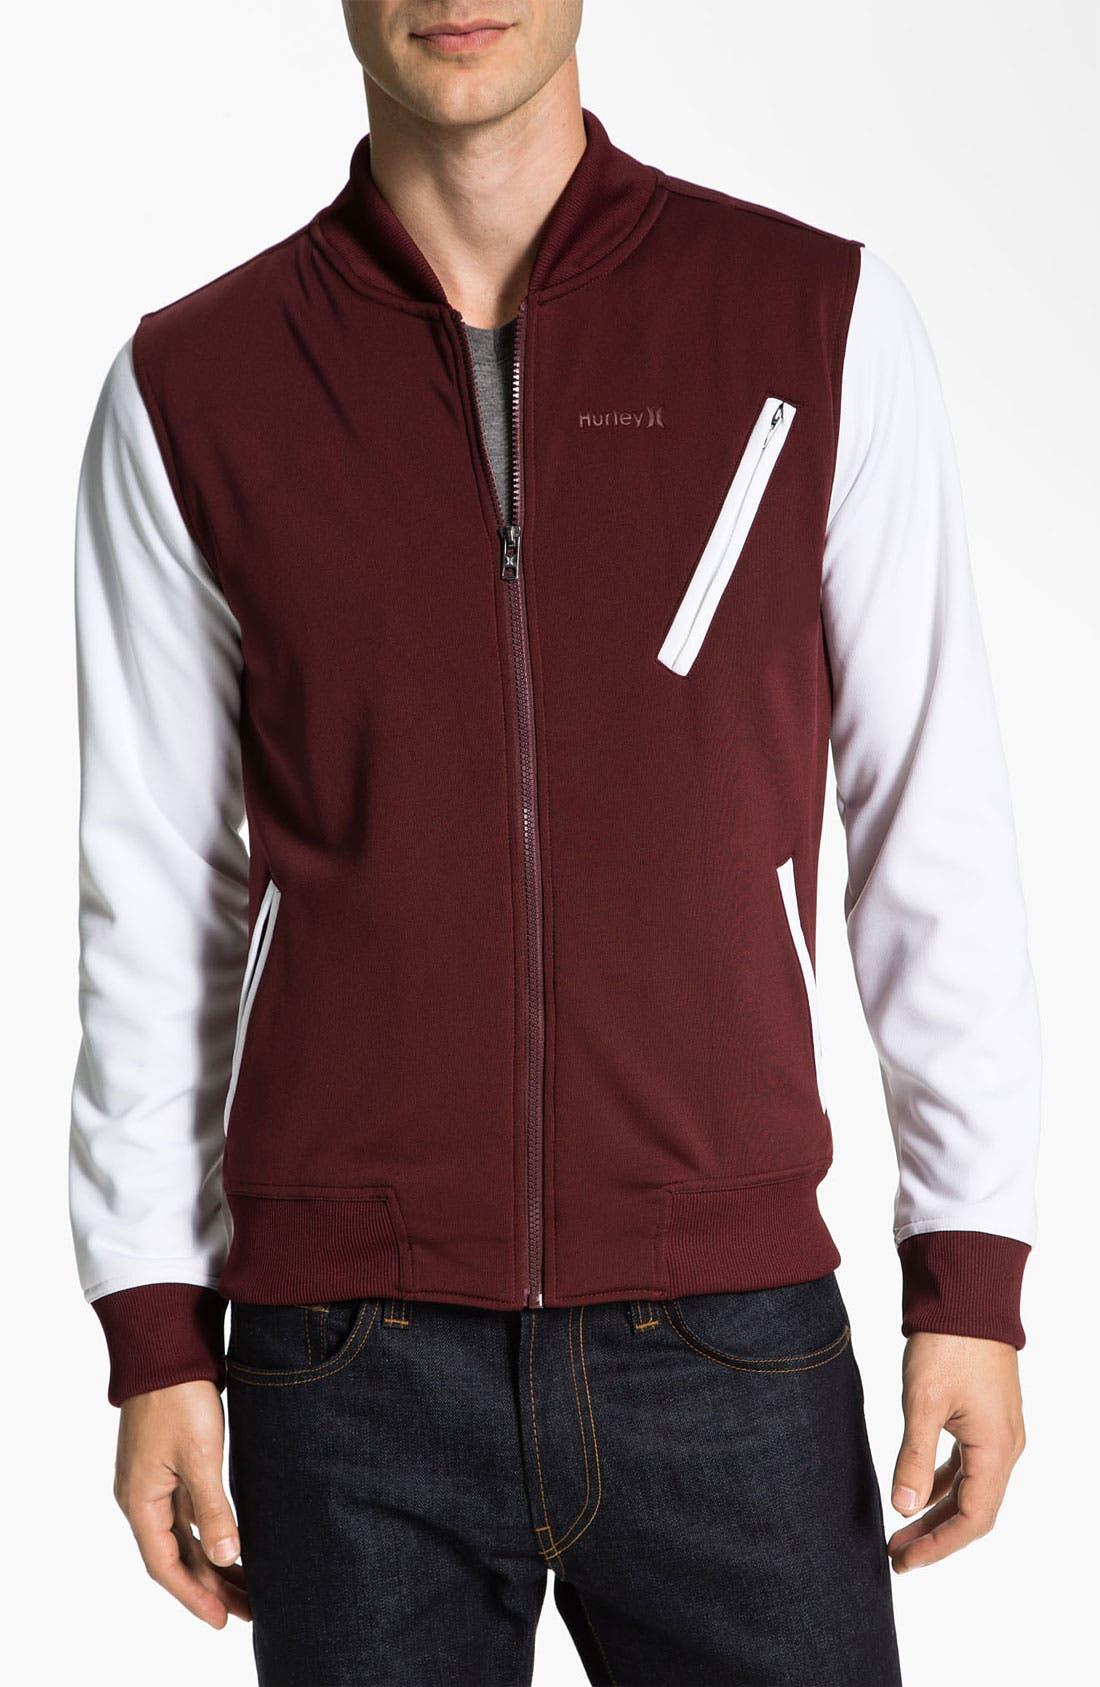 Alternate Image 1 Selected - Hurley 'Velocity' Fleece Varsity Jacket